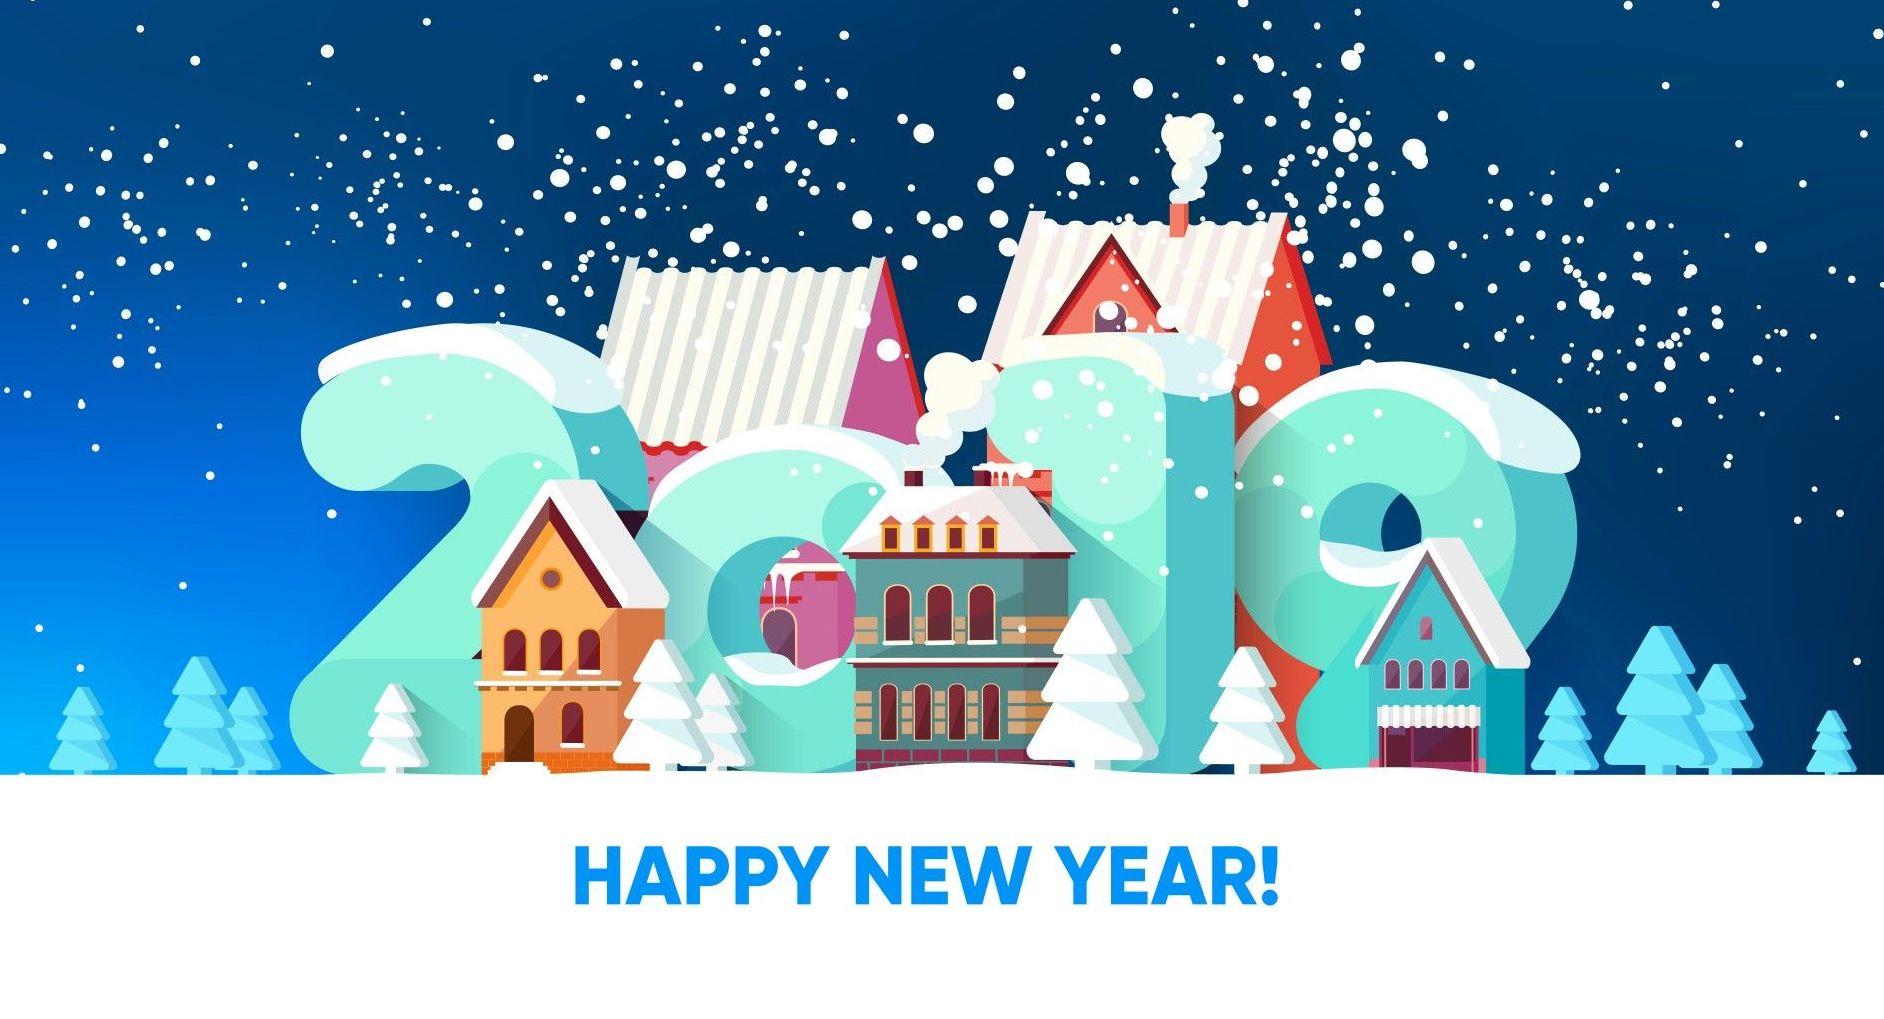 Beautiful New Year Wallpaper HD for your desktop 1884x1019